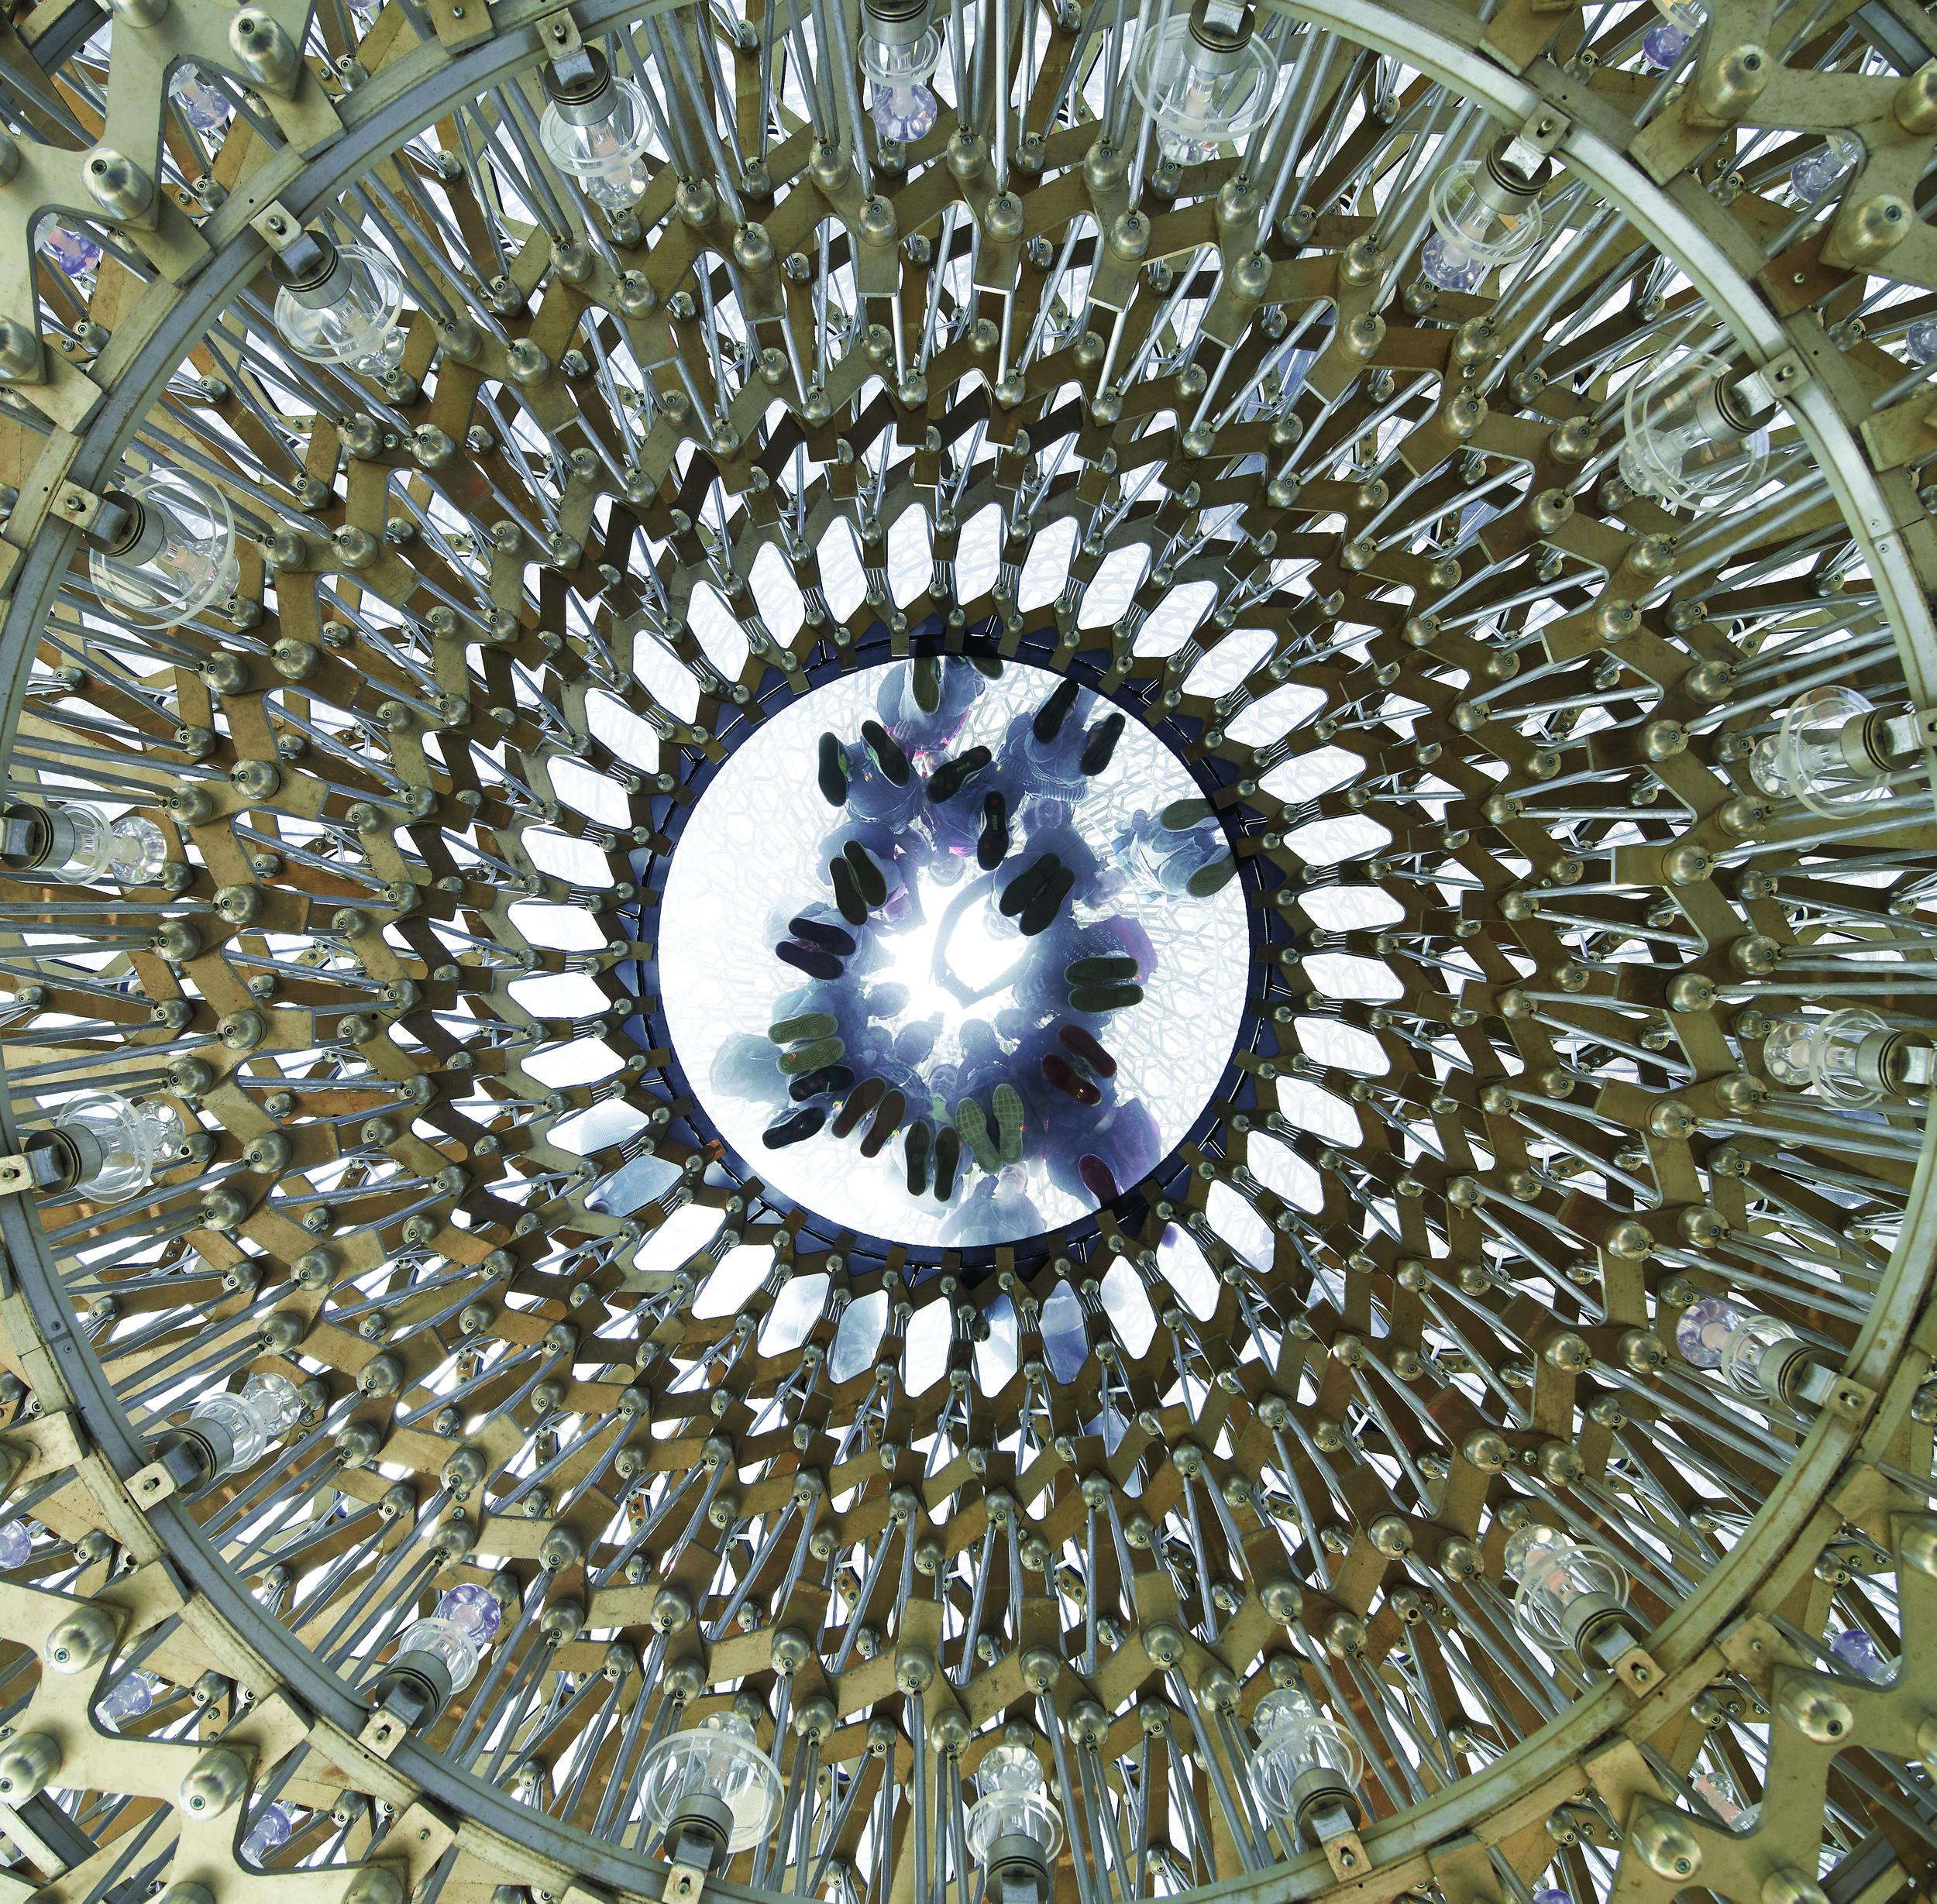 Underneath the UK Pavilion Hive, Courtesy of UKTI, Photographer Credit - Hufton+Crow.jpg